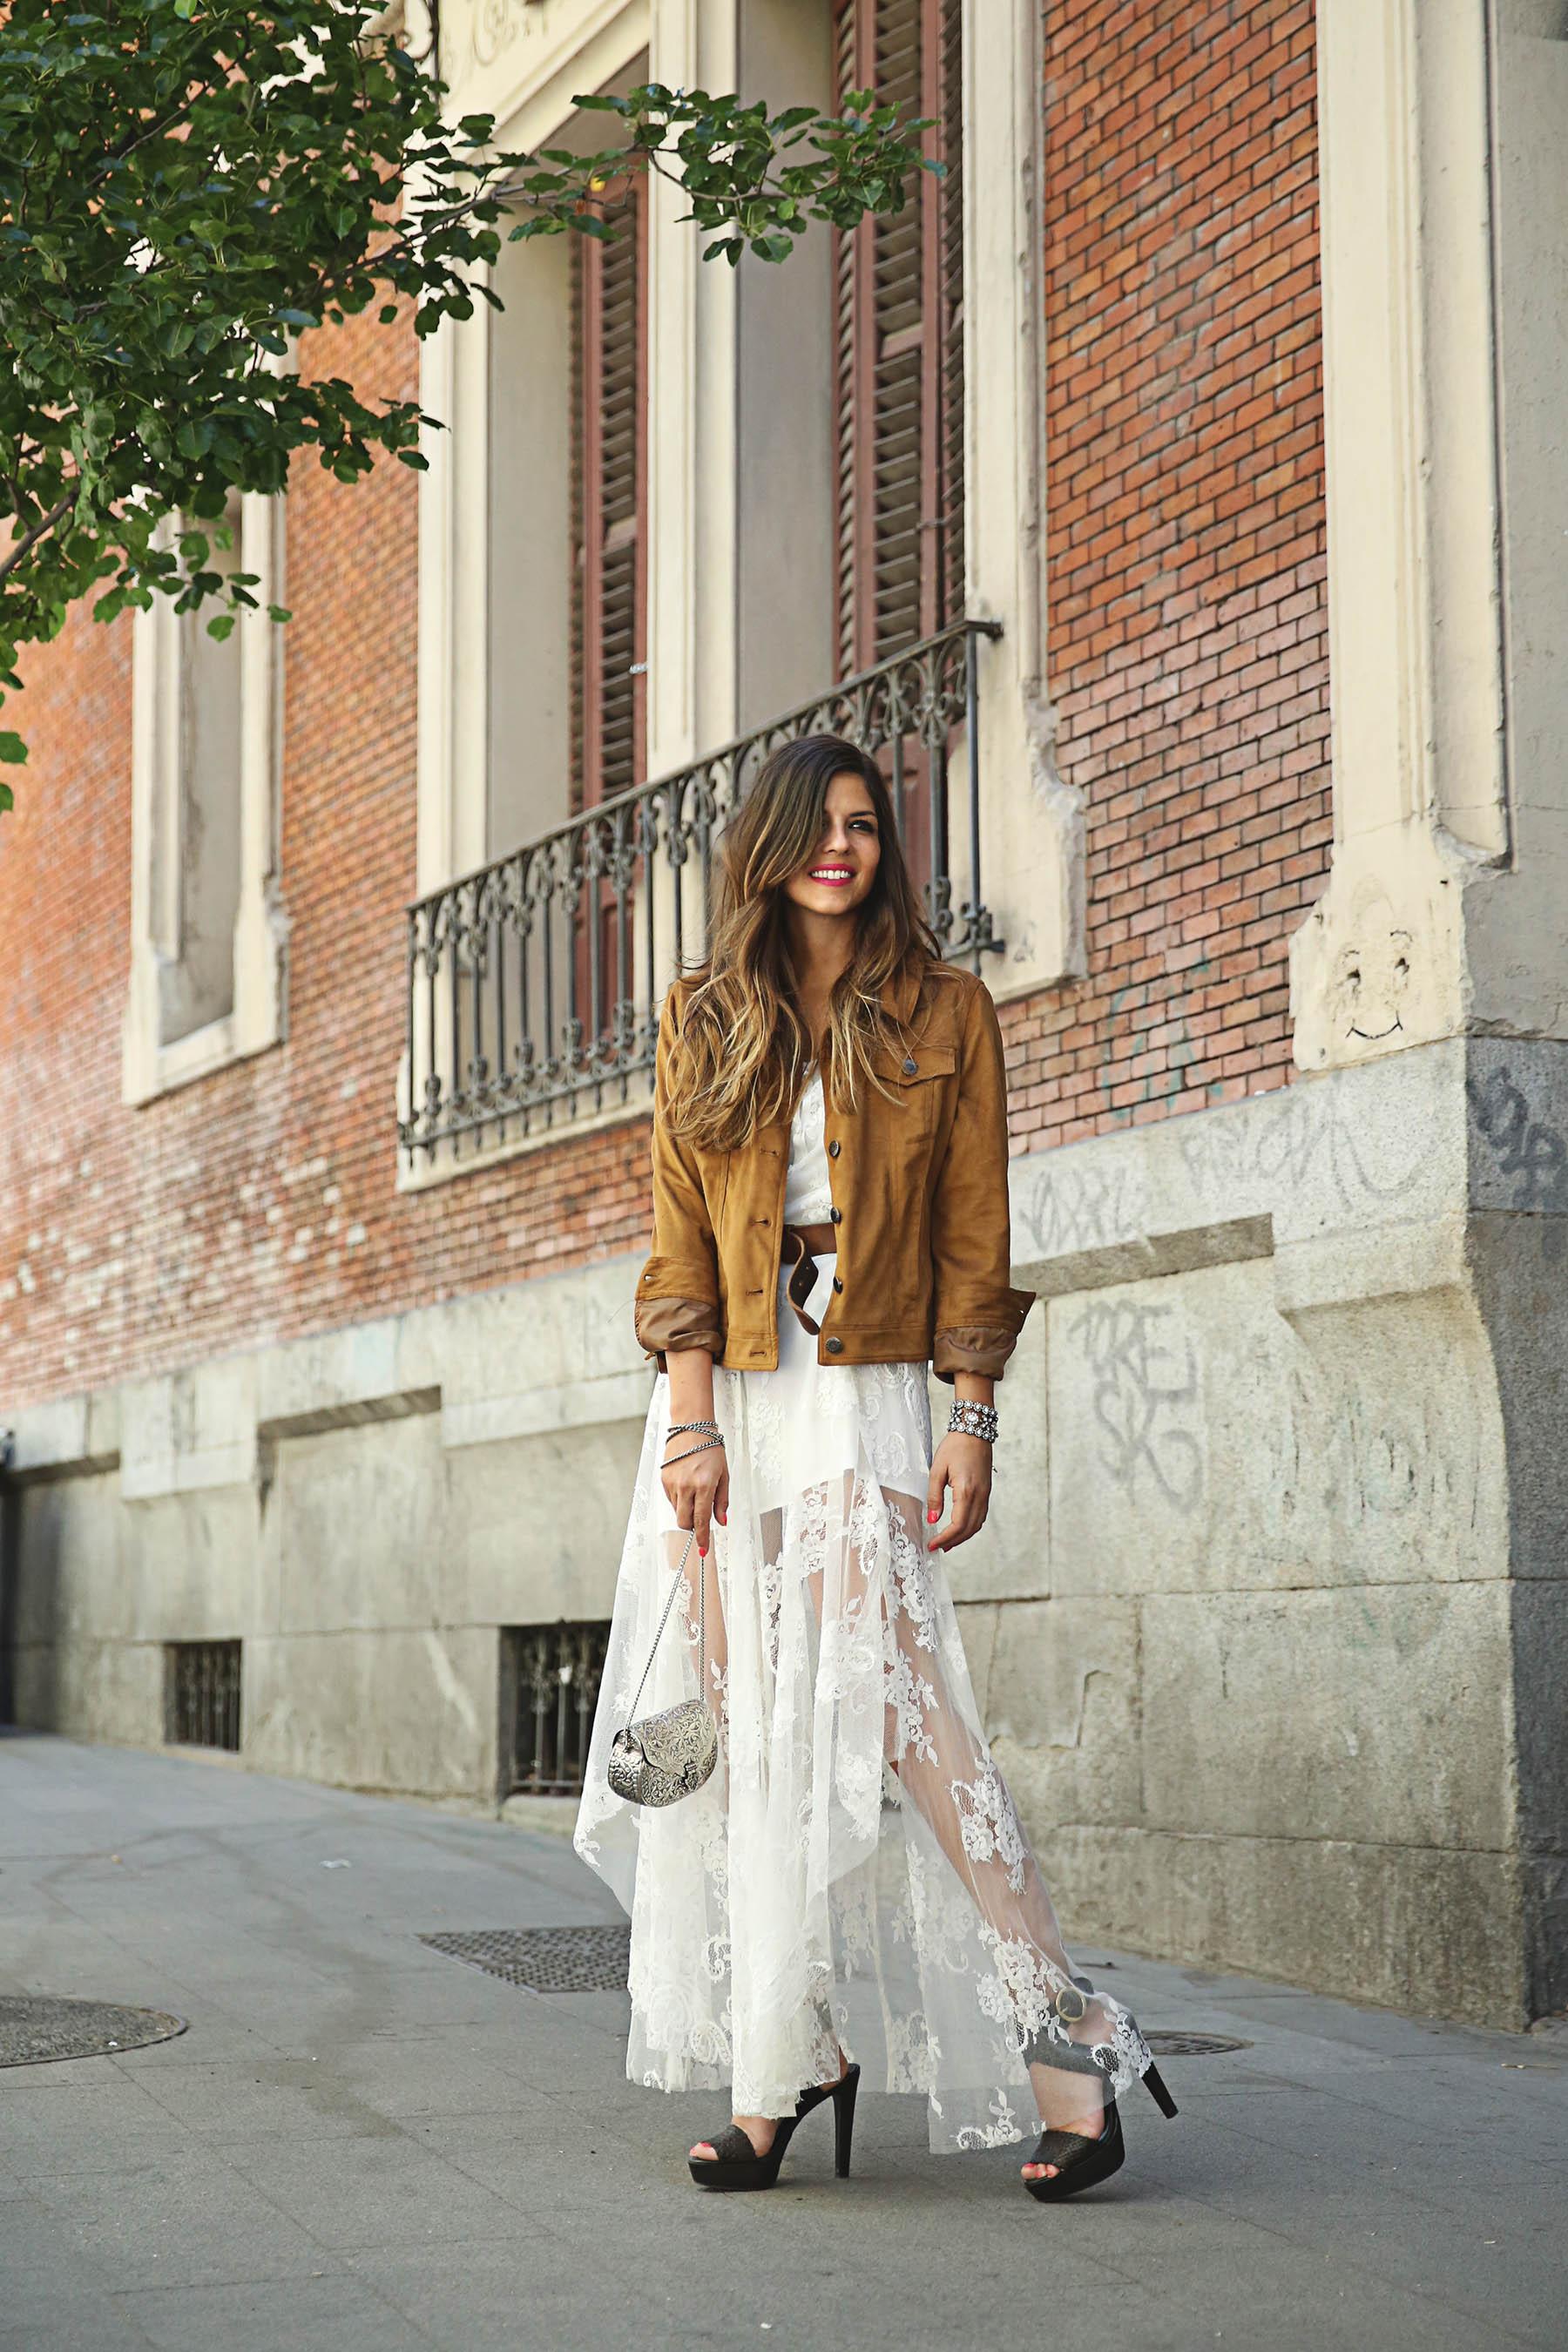 trendy-taste-look-outfit-street-style-ootd-blog-blogger-fashiopn-spain-moda-españa-magnum-juana-acosta-maje-8